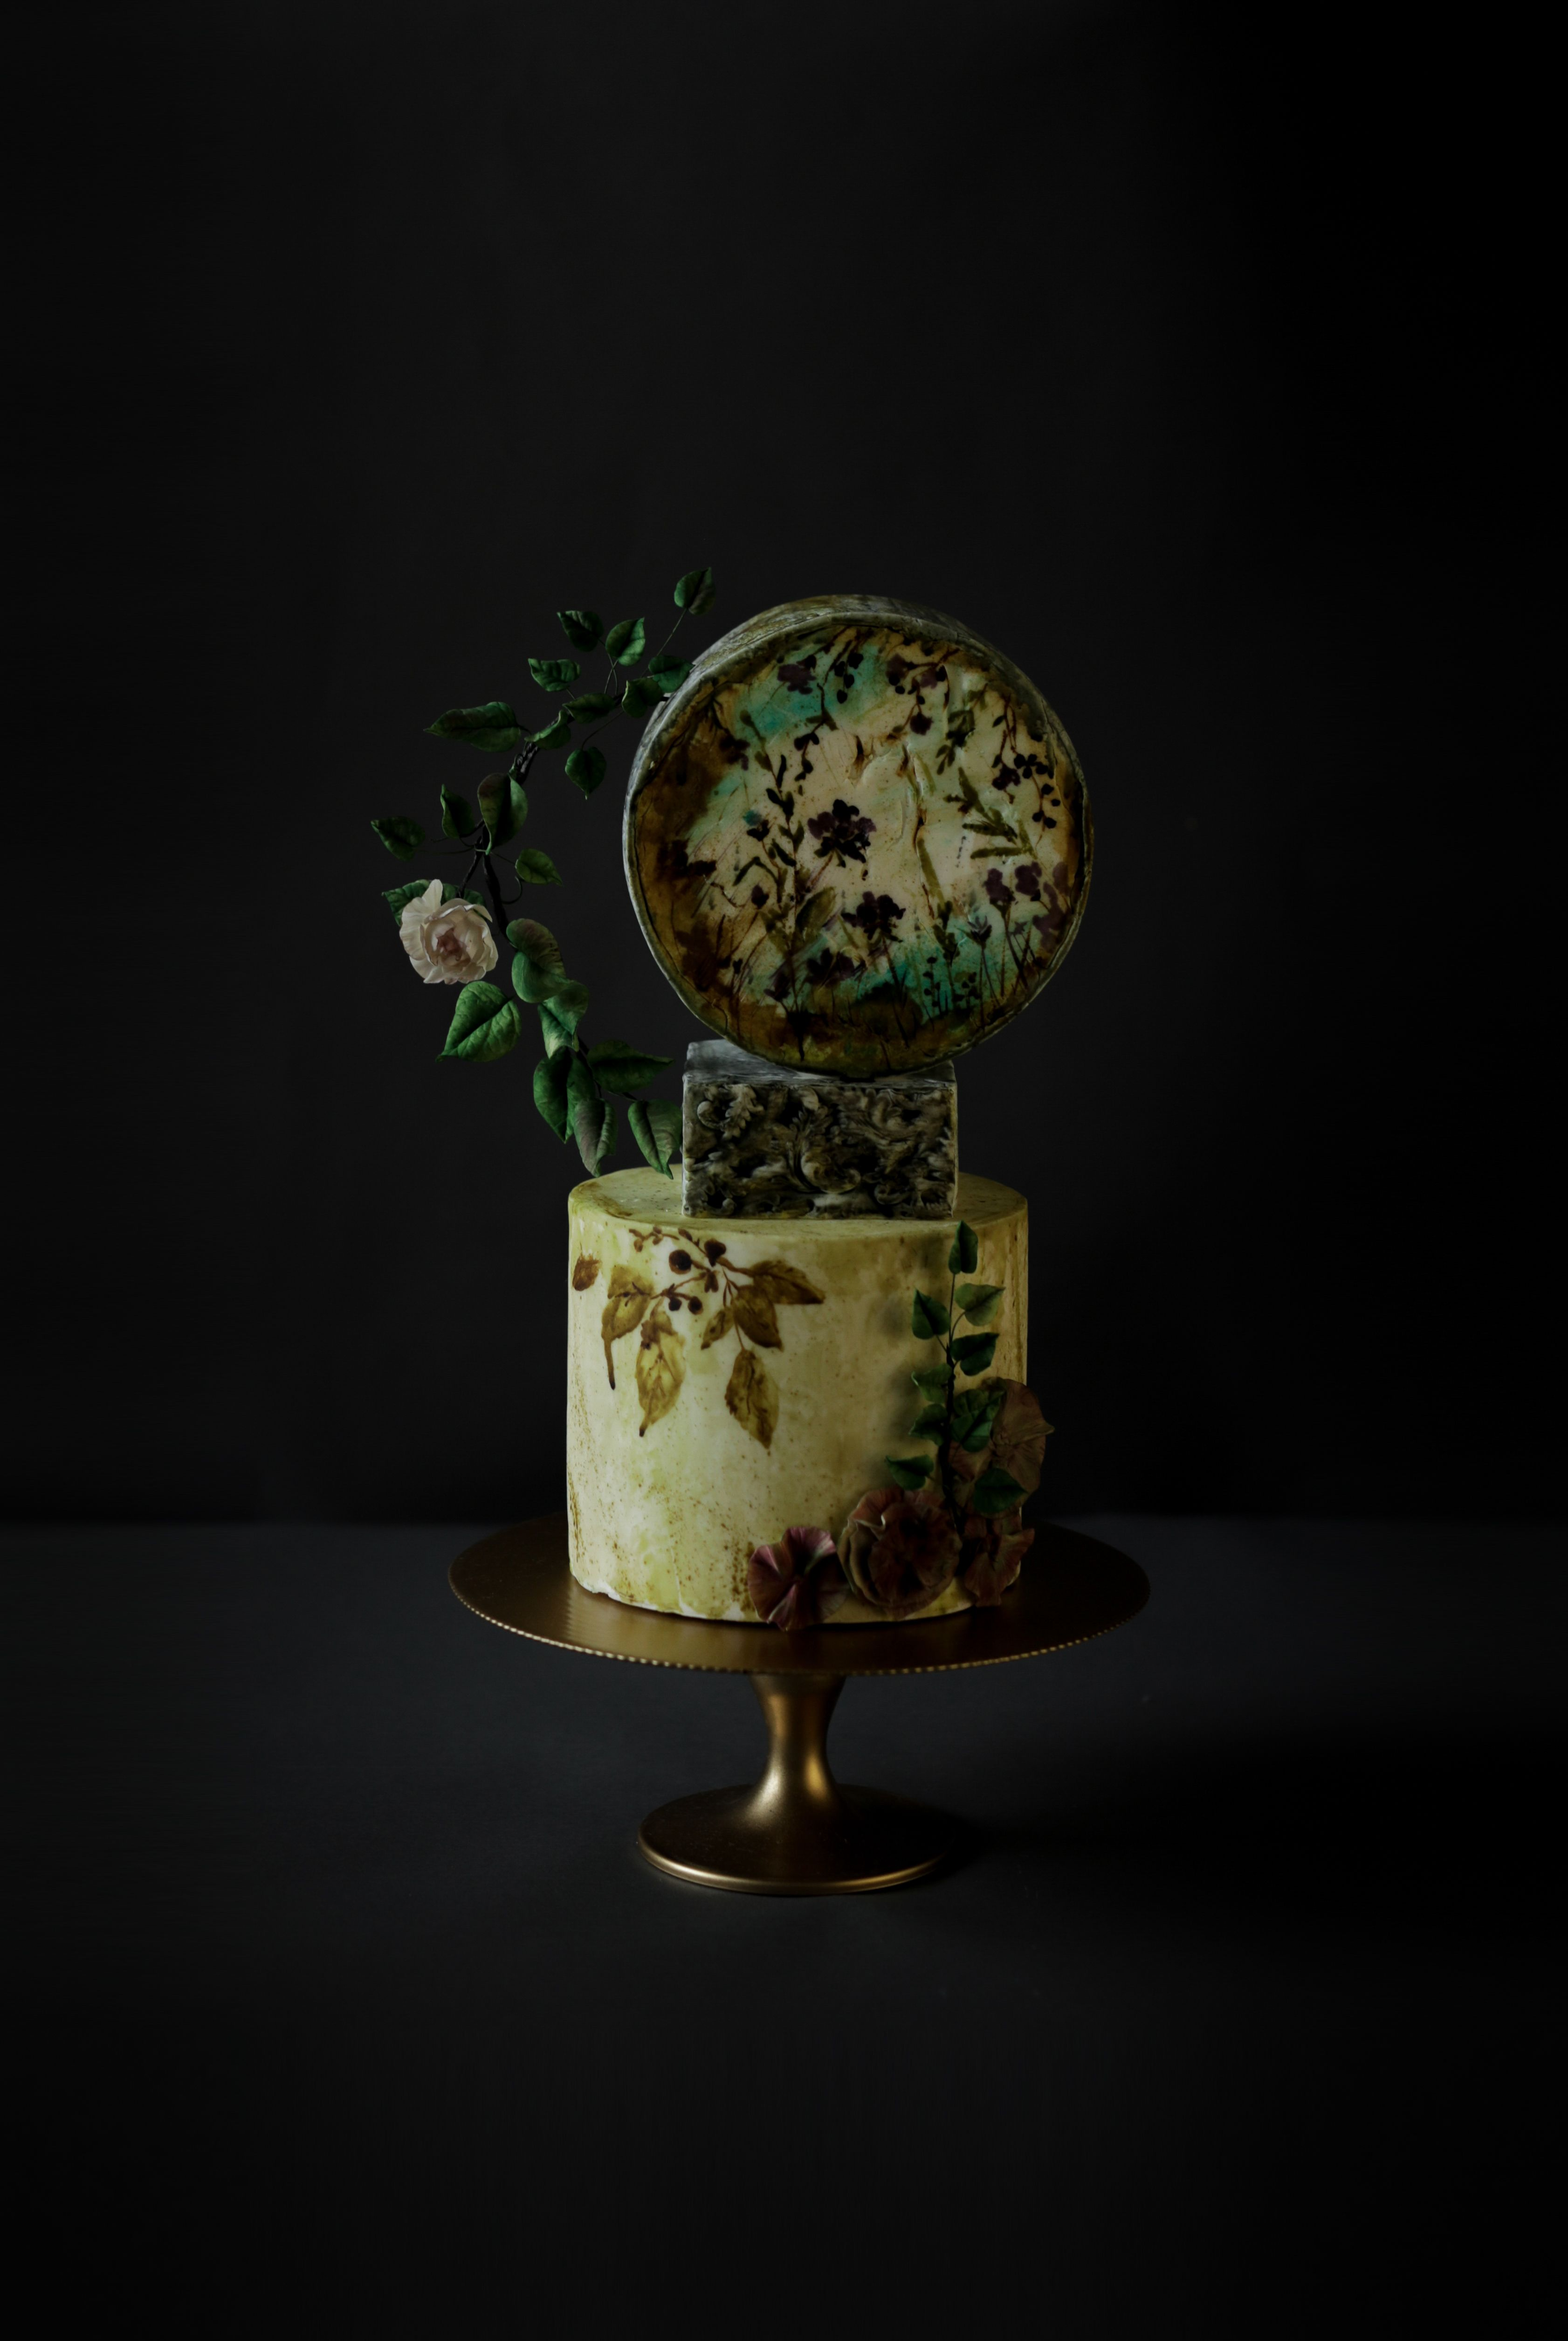 edible flowers for cakes tesco